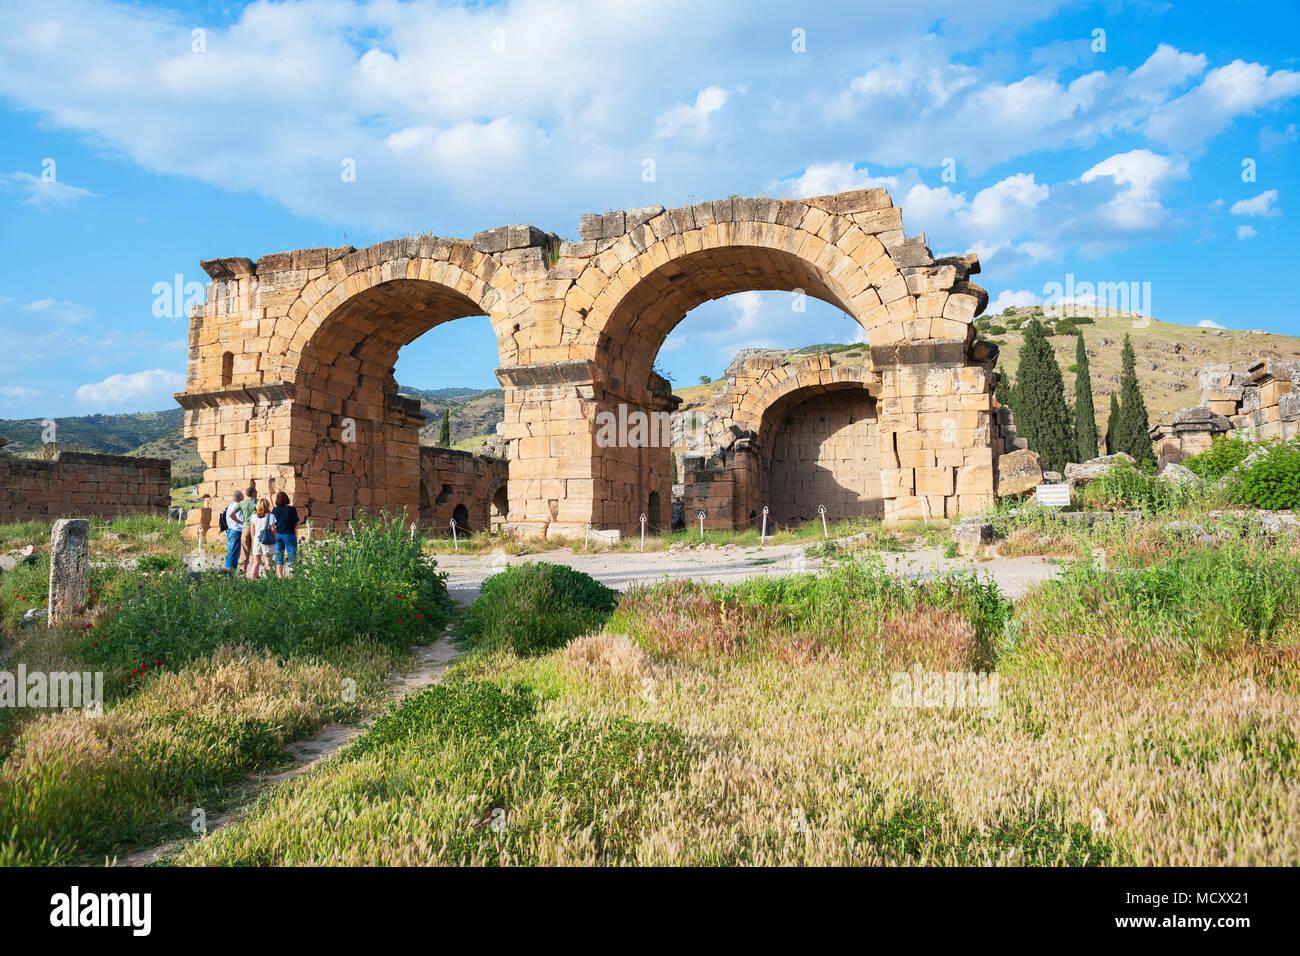 Ruins of basilica, Hierapolis, Pamukkale, Denizli, Anatolia, Turkey - Stock Image